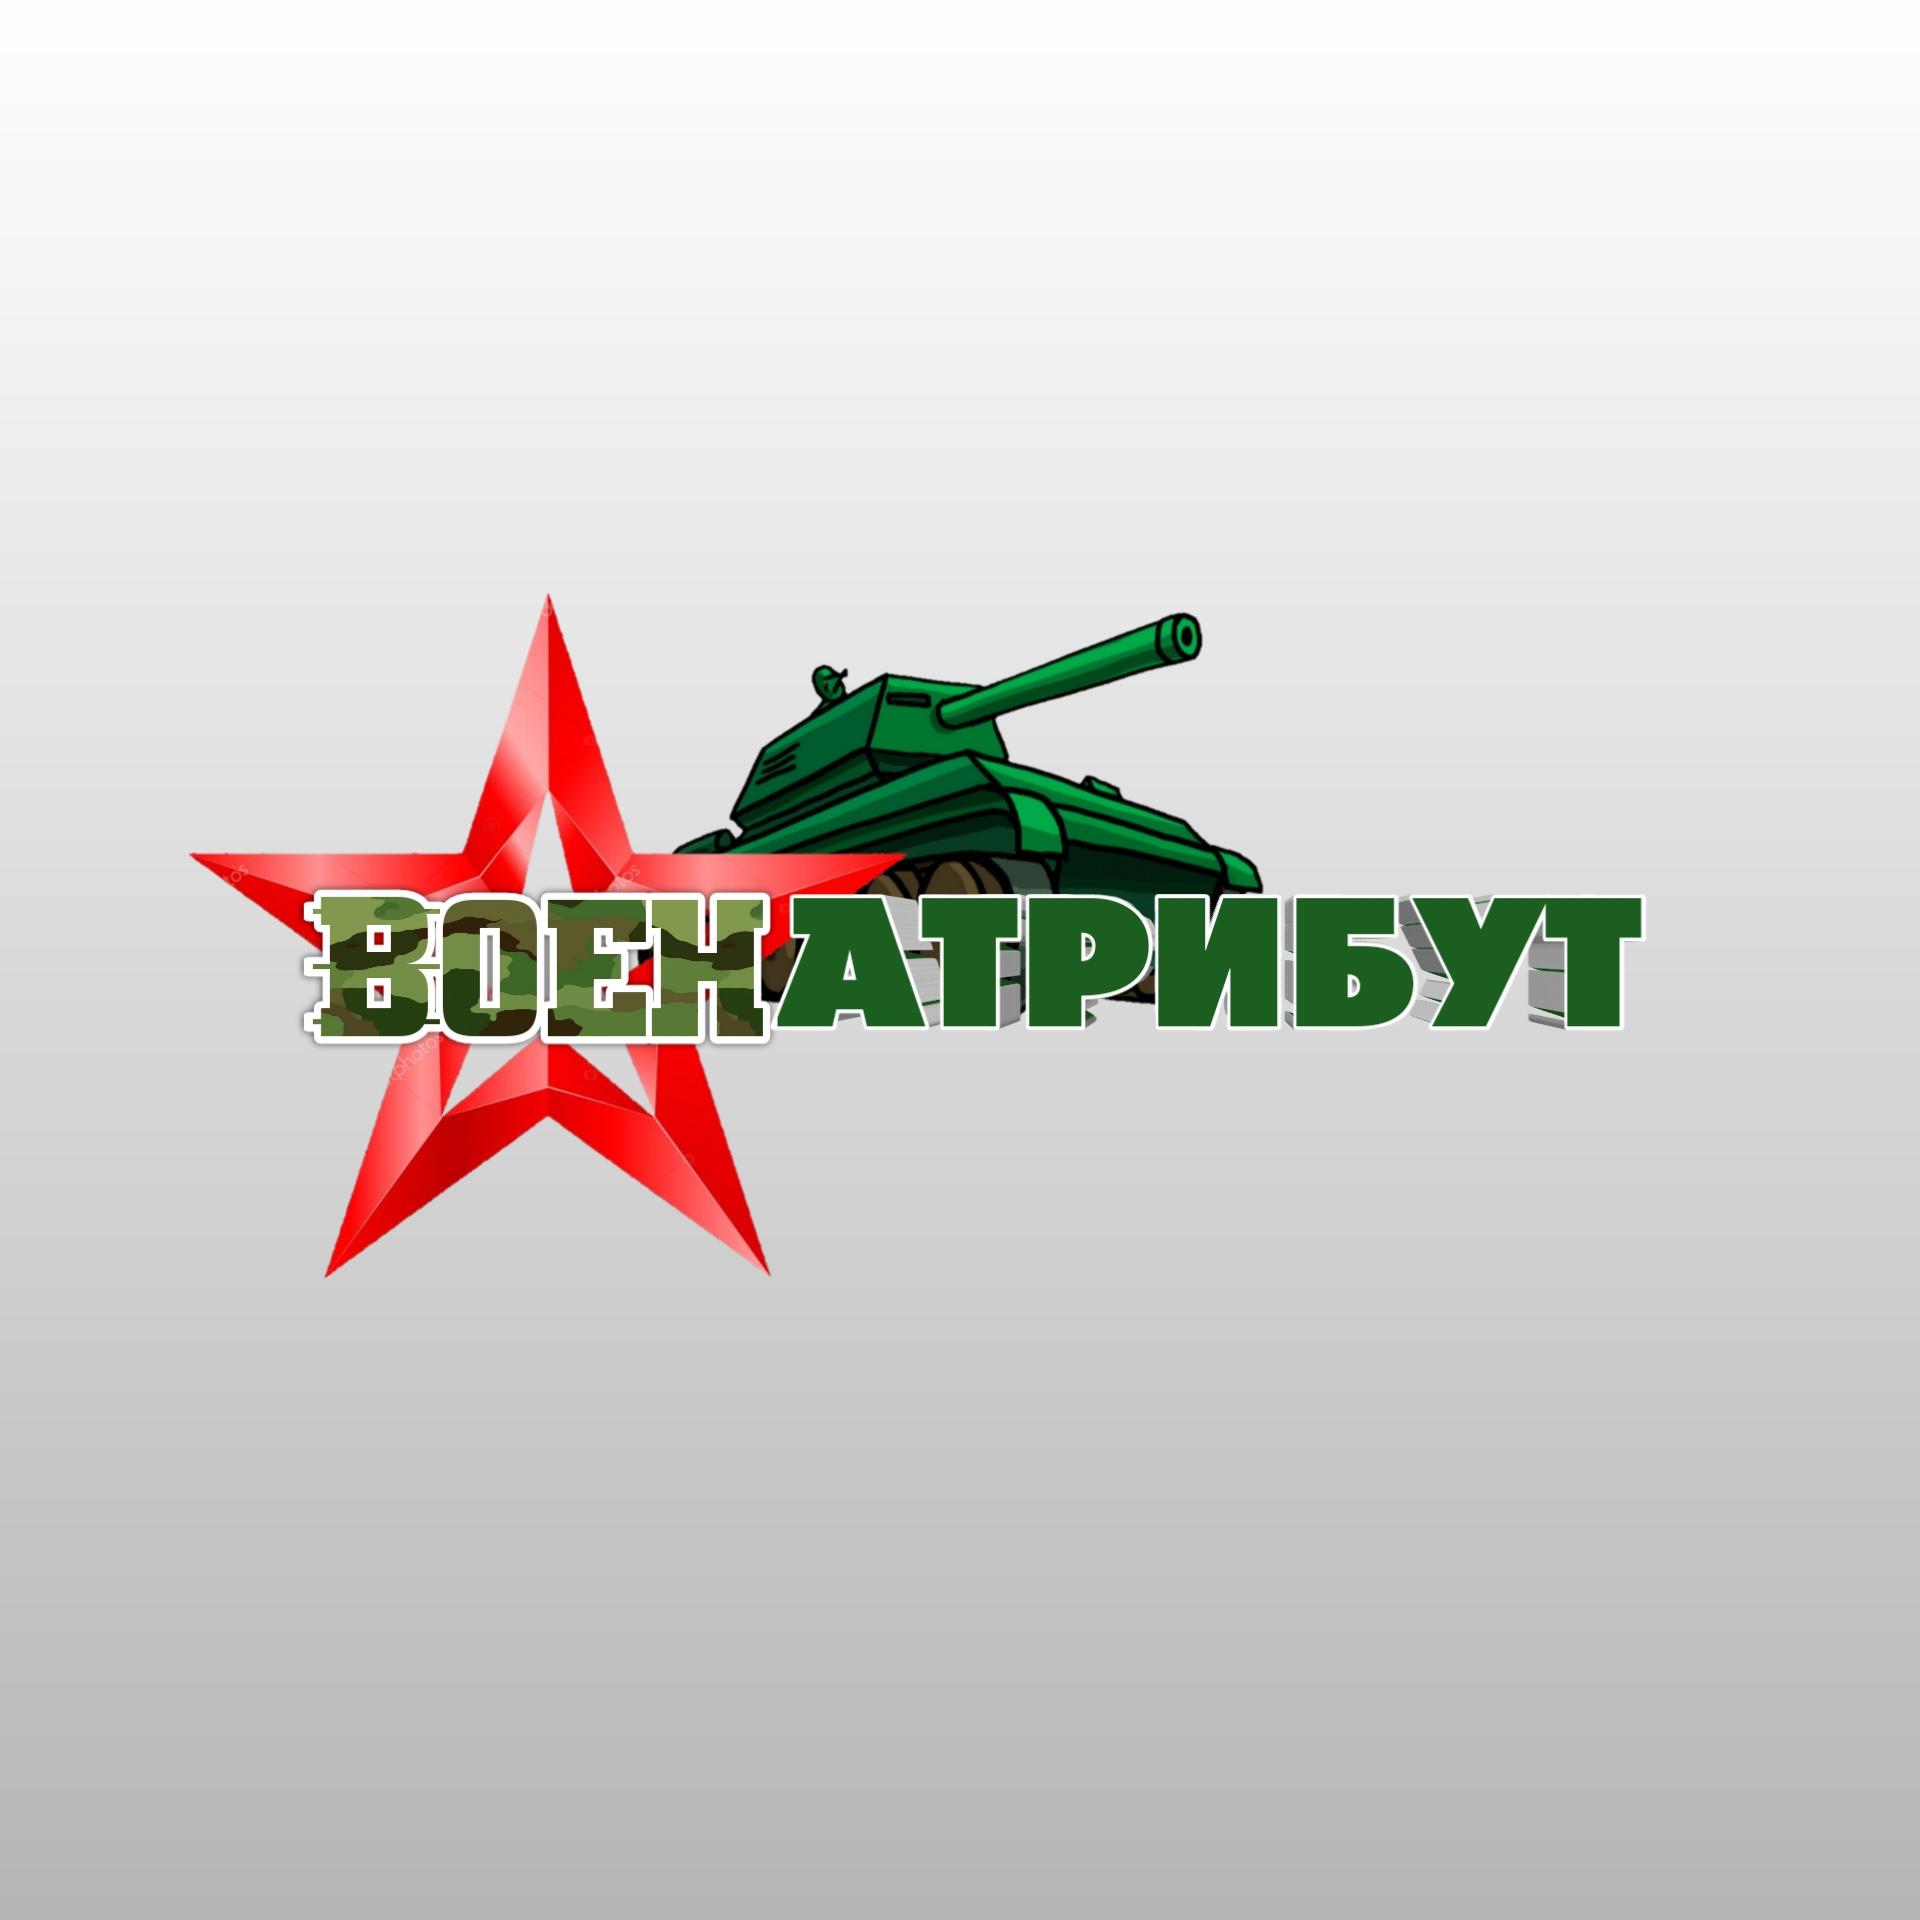 Разработка логотипа для компании военной тематики фото f_167601be5c6005aa.jpg